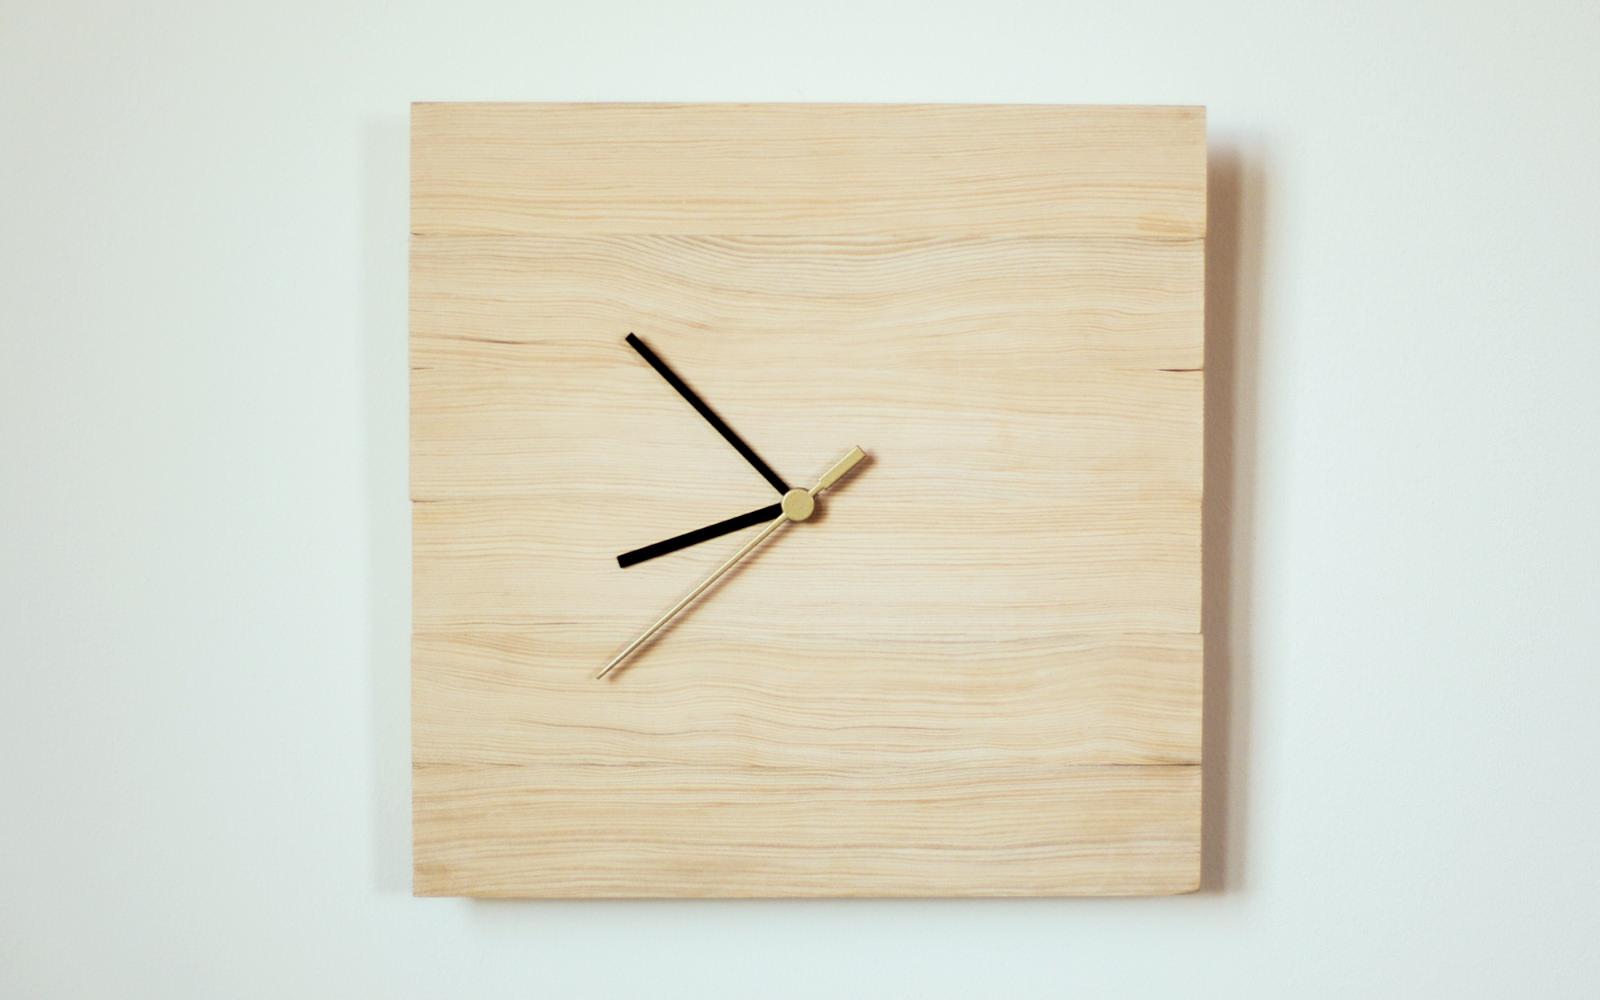 Ikea clock hack how to make your own idea clock dunn diy for Ikea tukwila wa